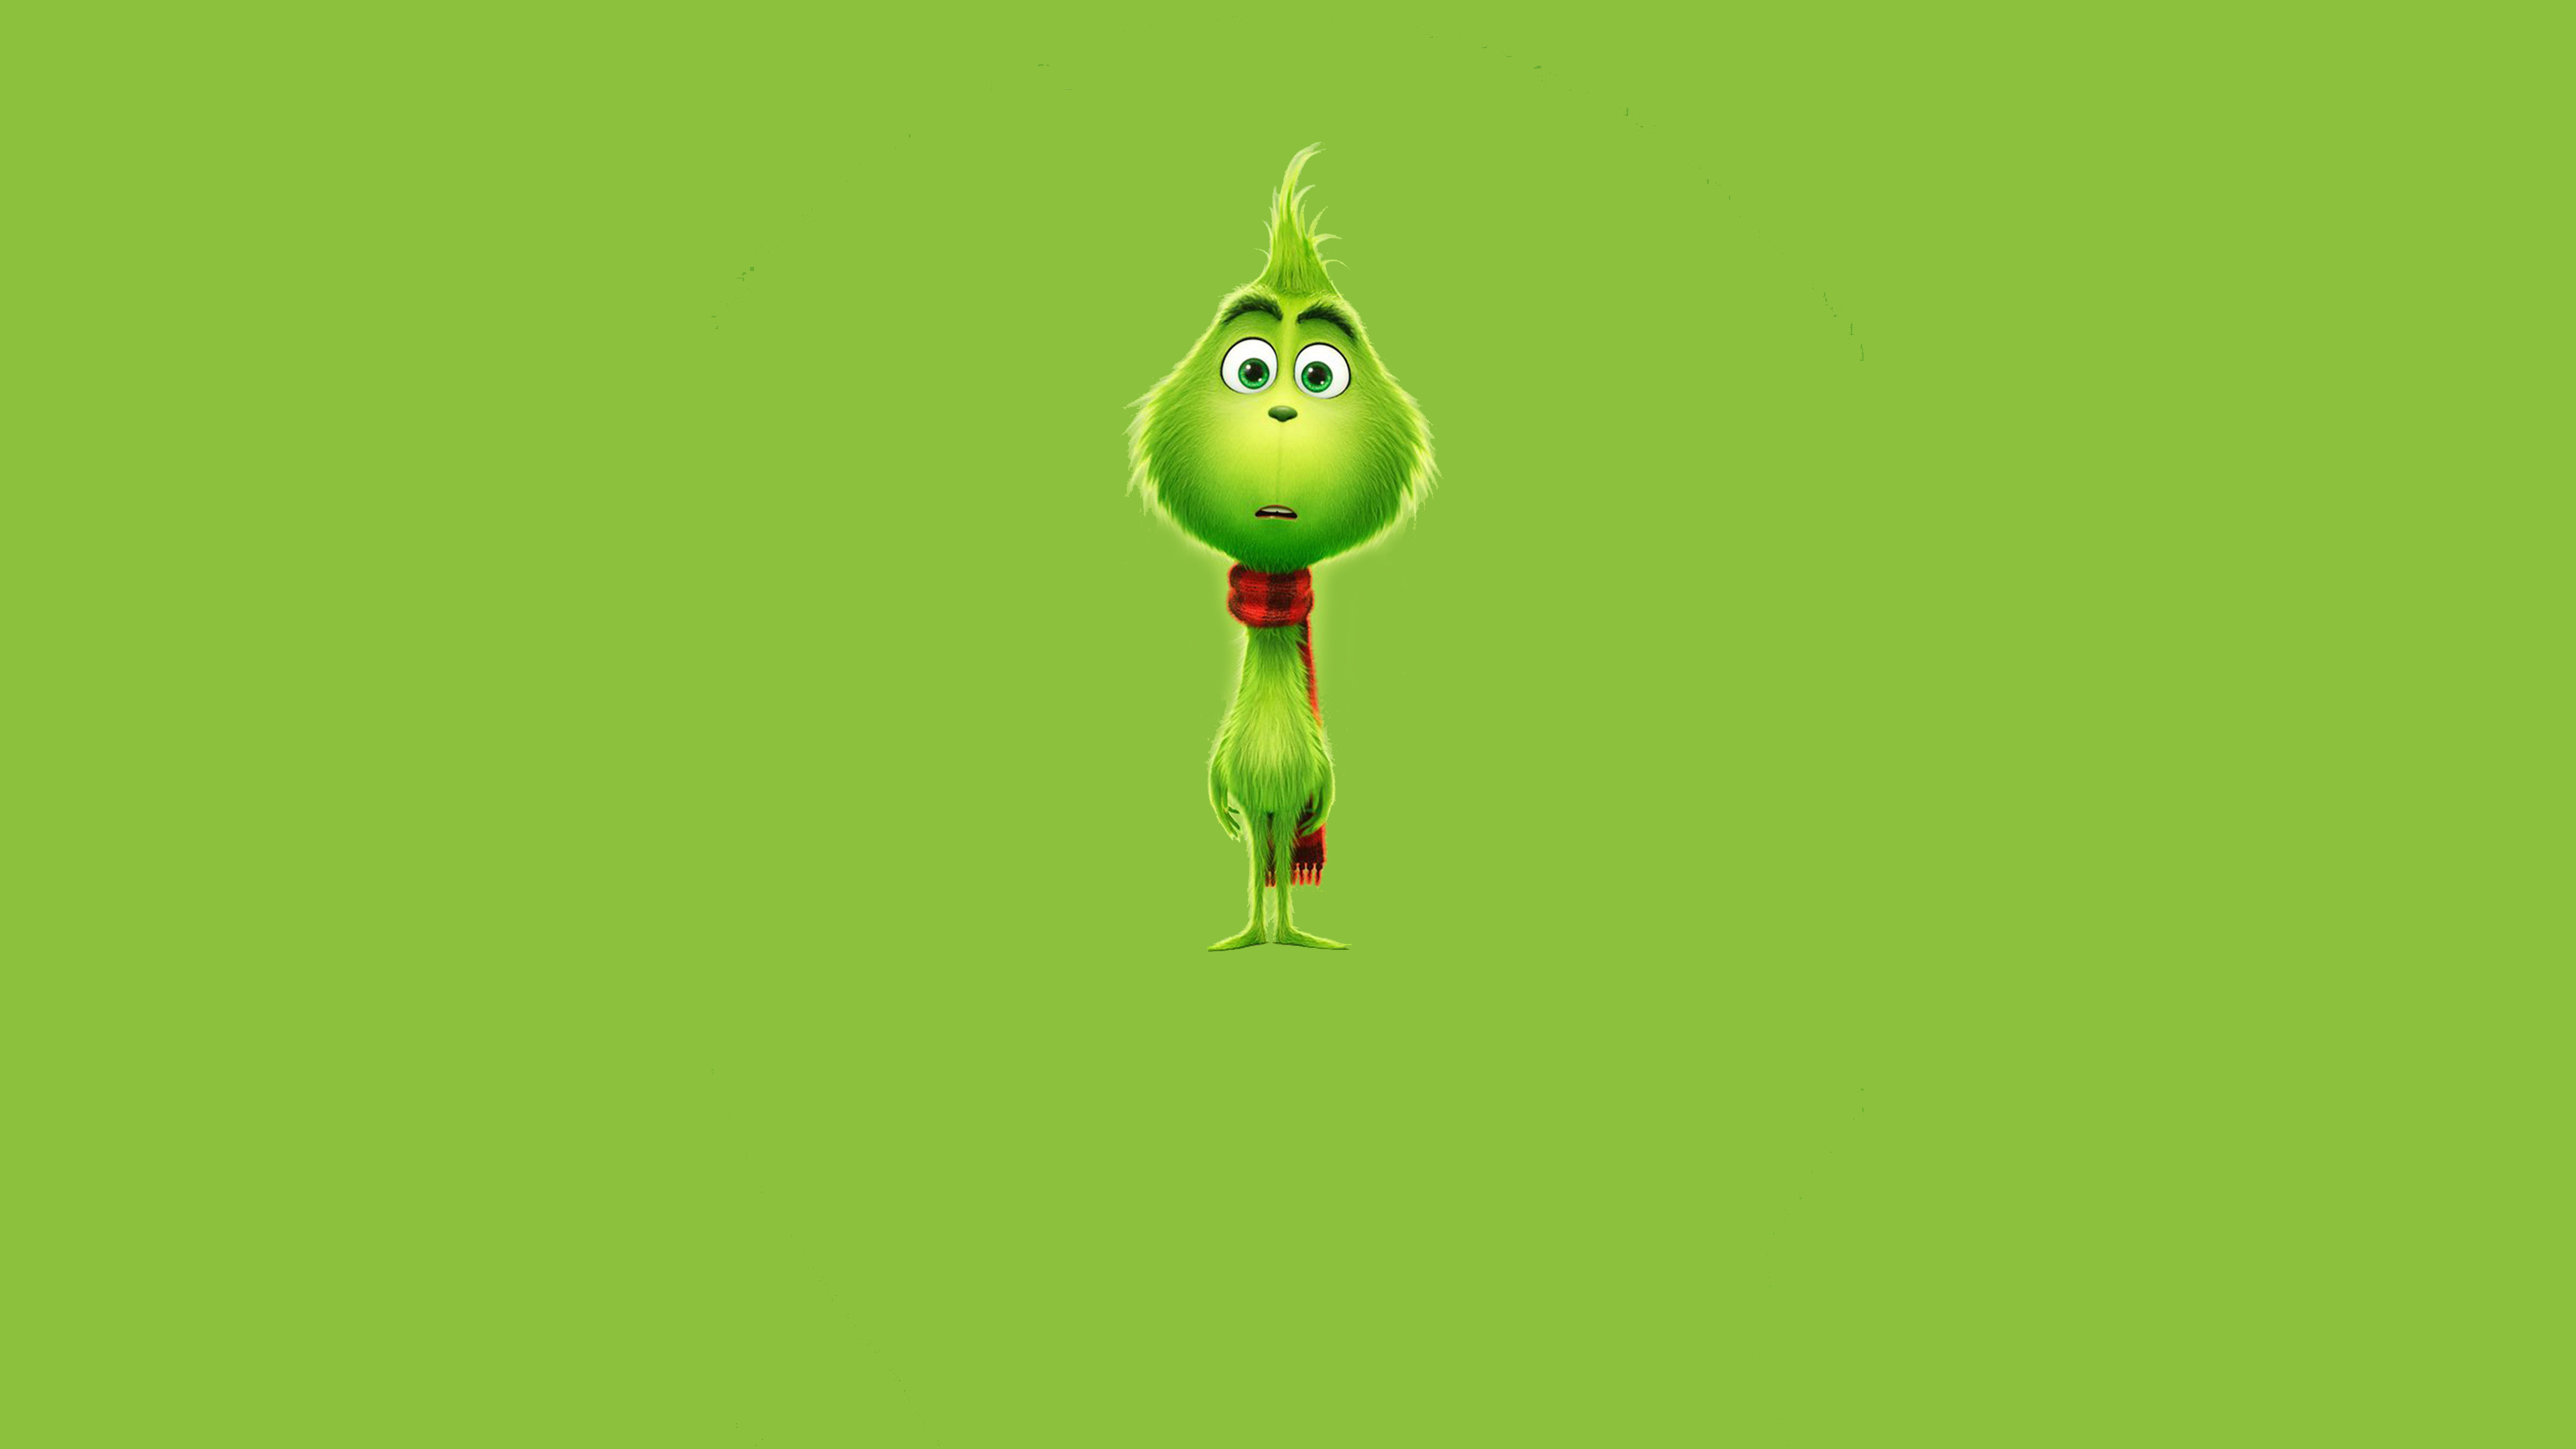 76 Grinch Desktop Wallpapers on WallpaperPlay 3840x2160